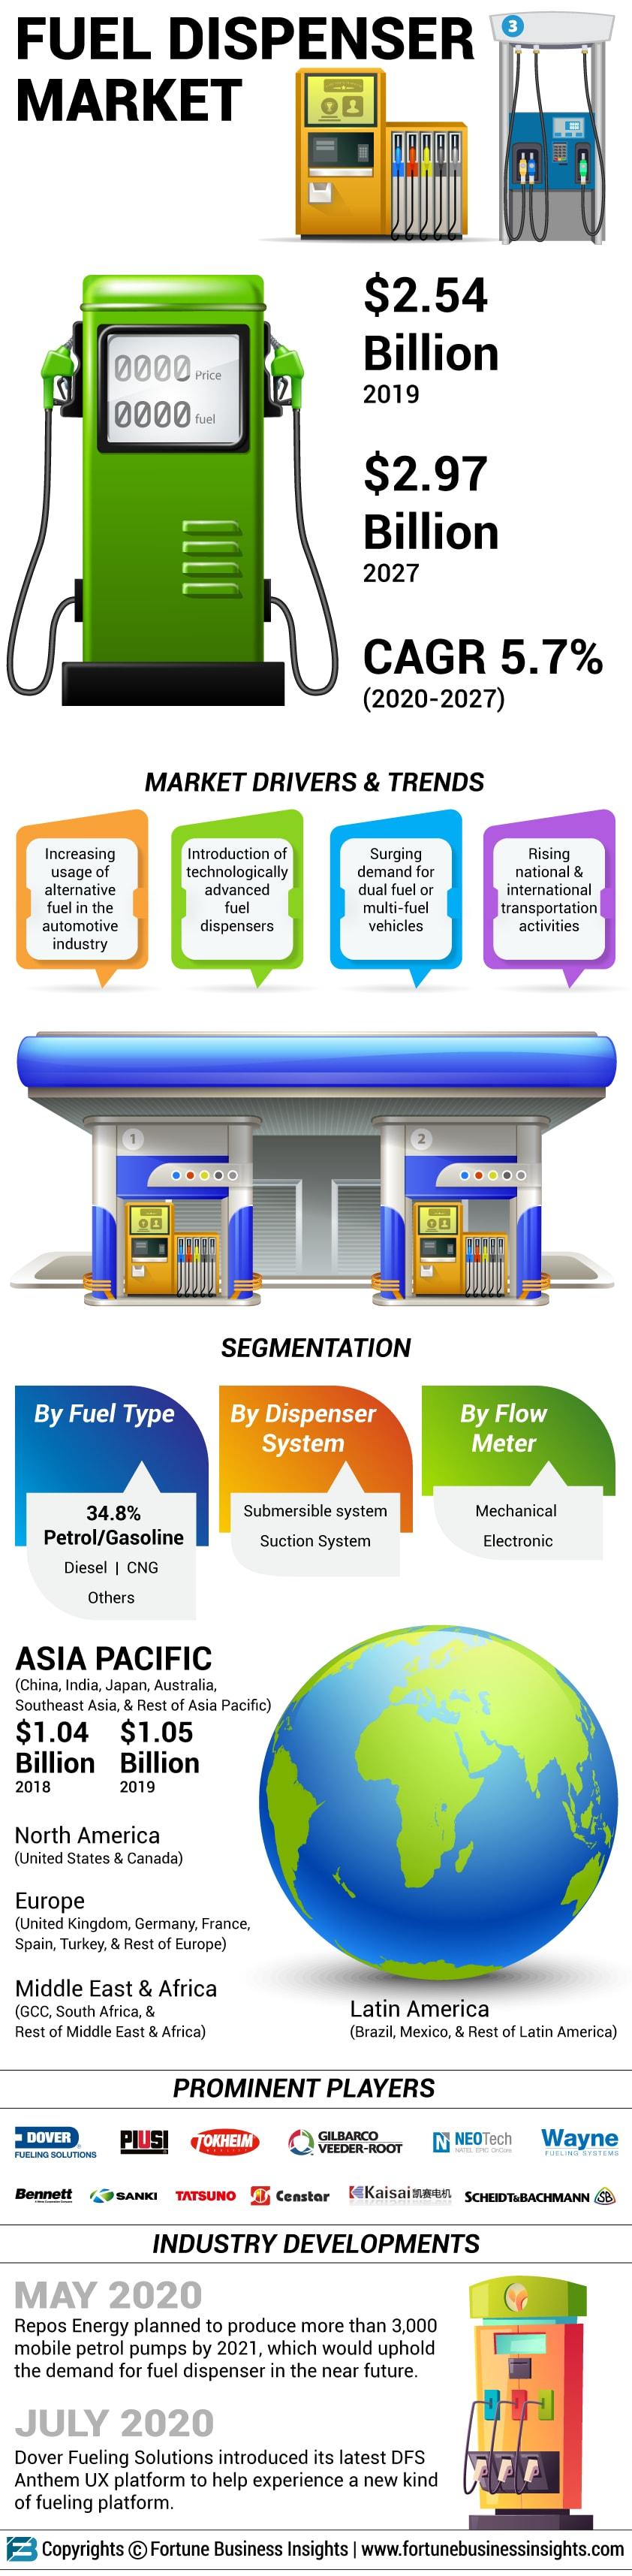 Fuel Dispensers Market